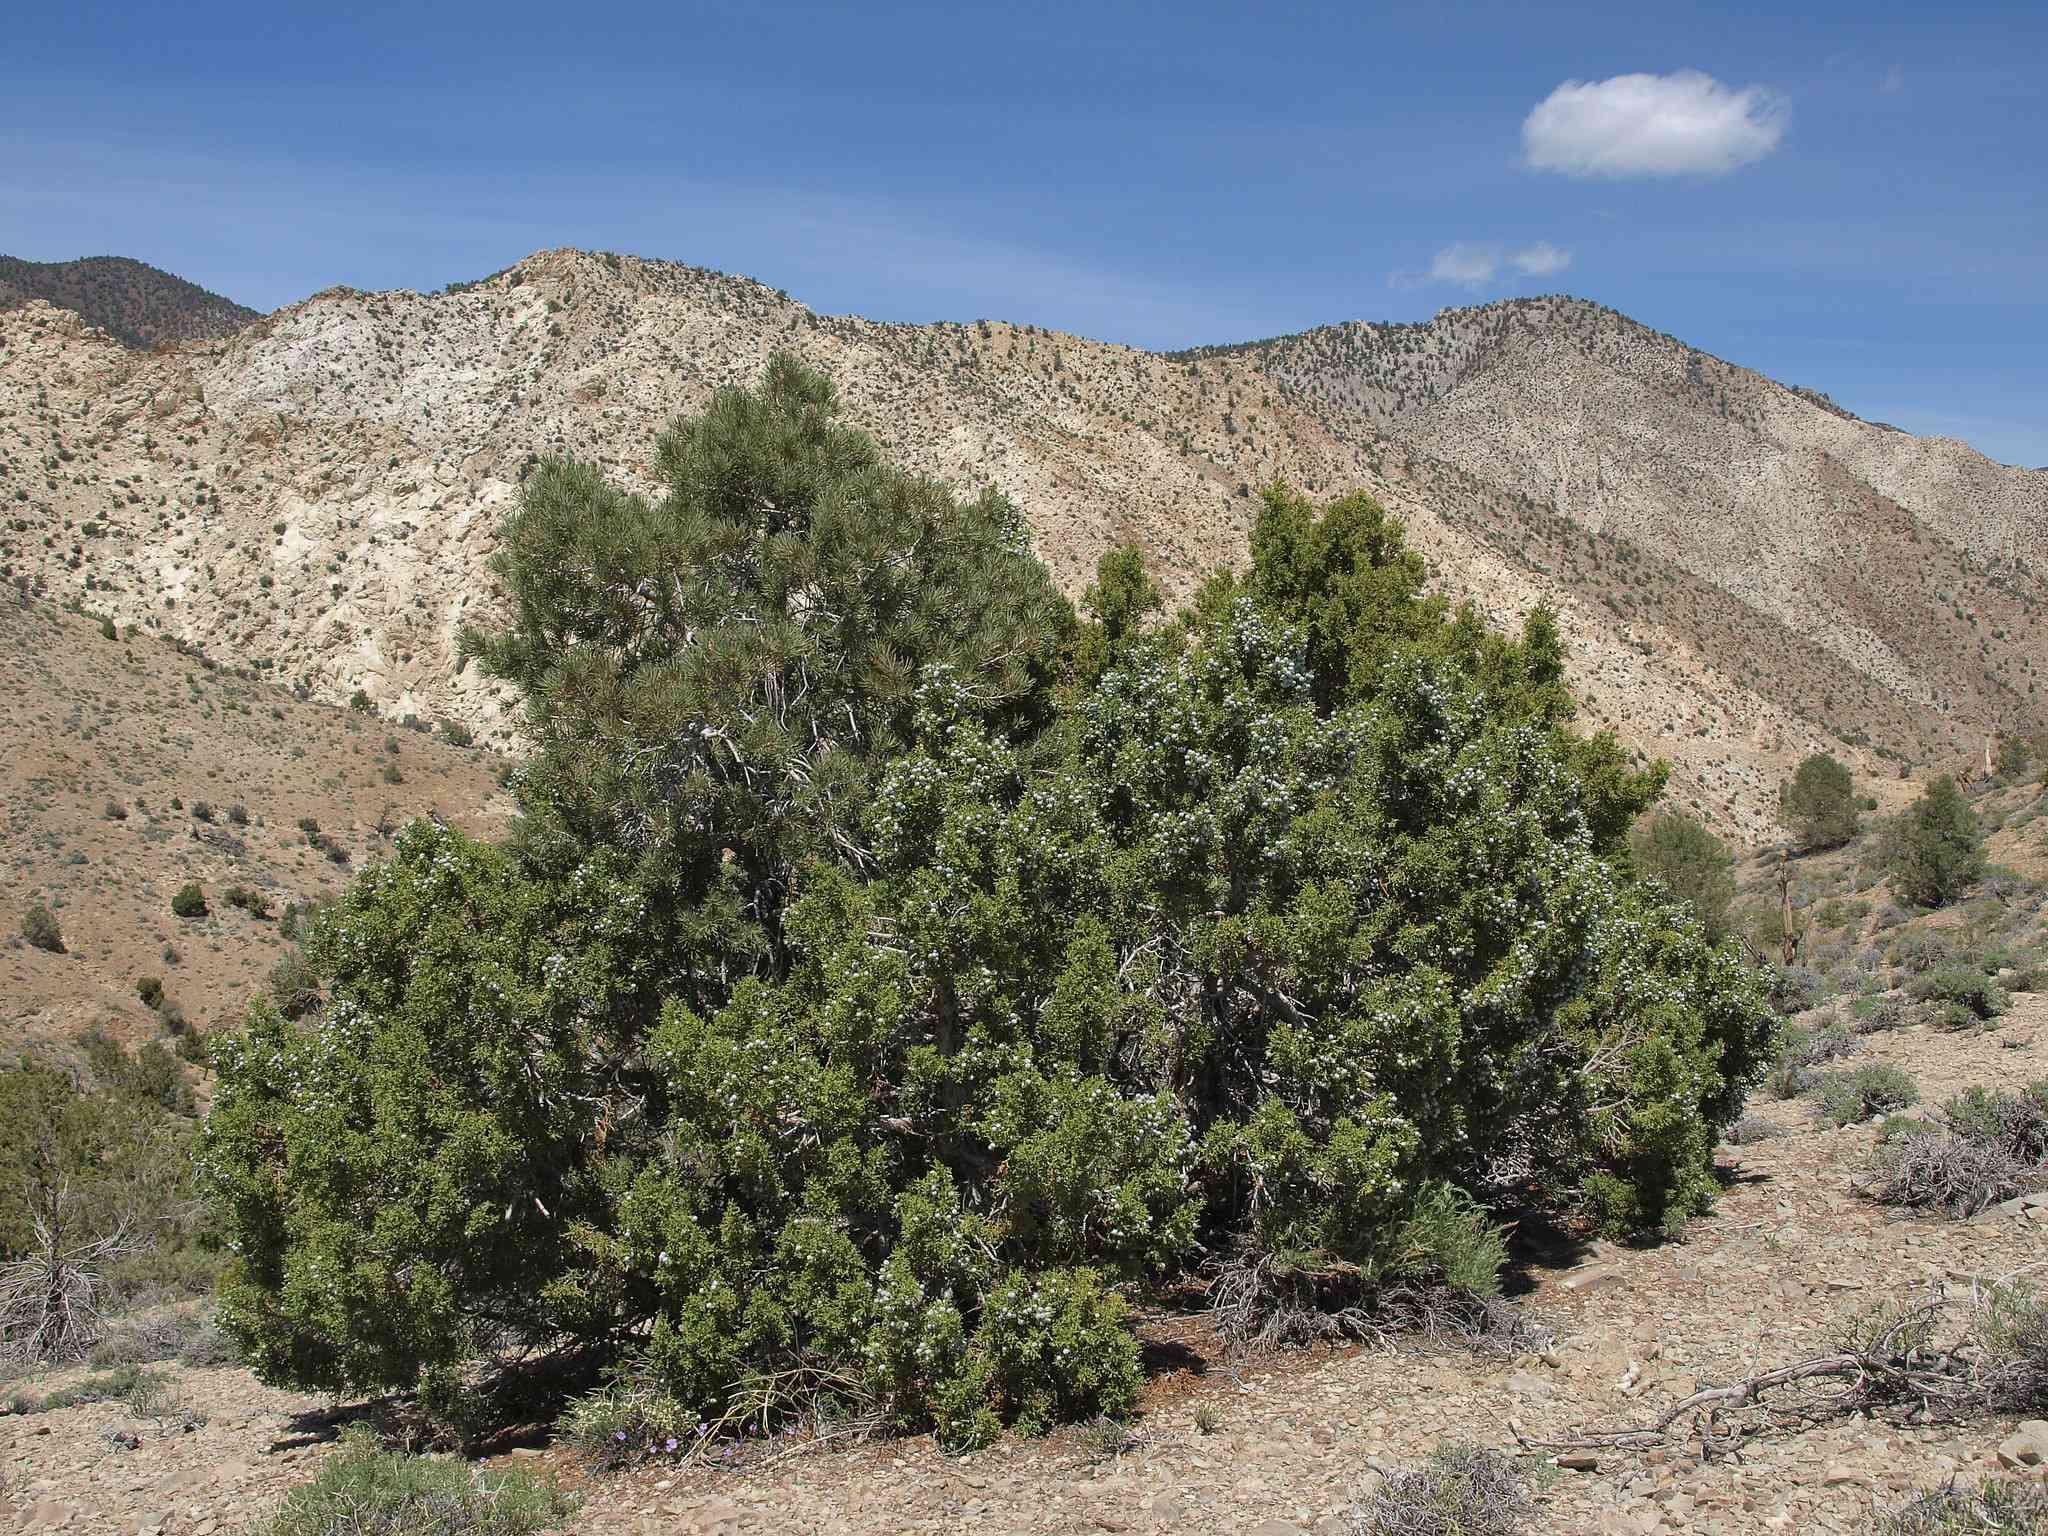 A Juniper in a desert setting in against hill backdrop.